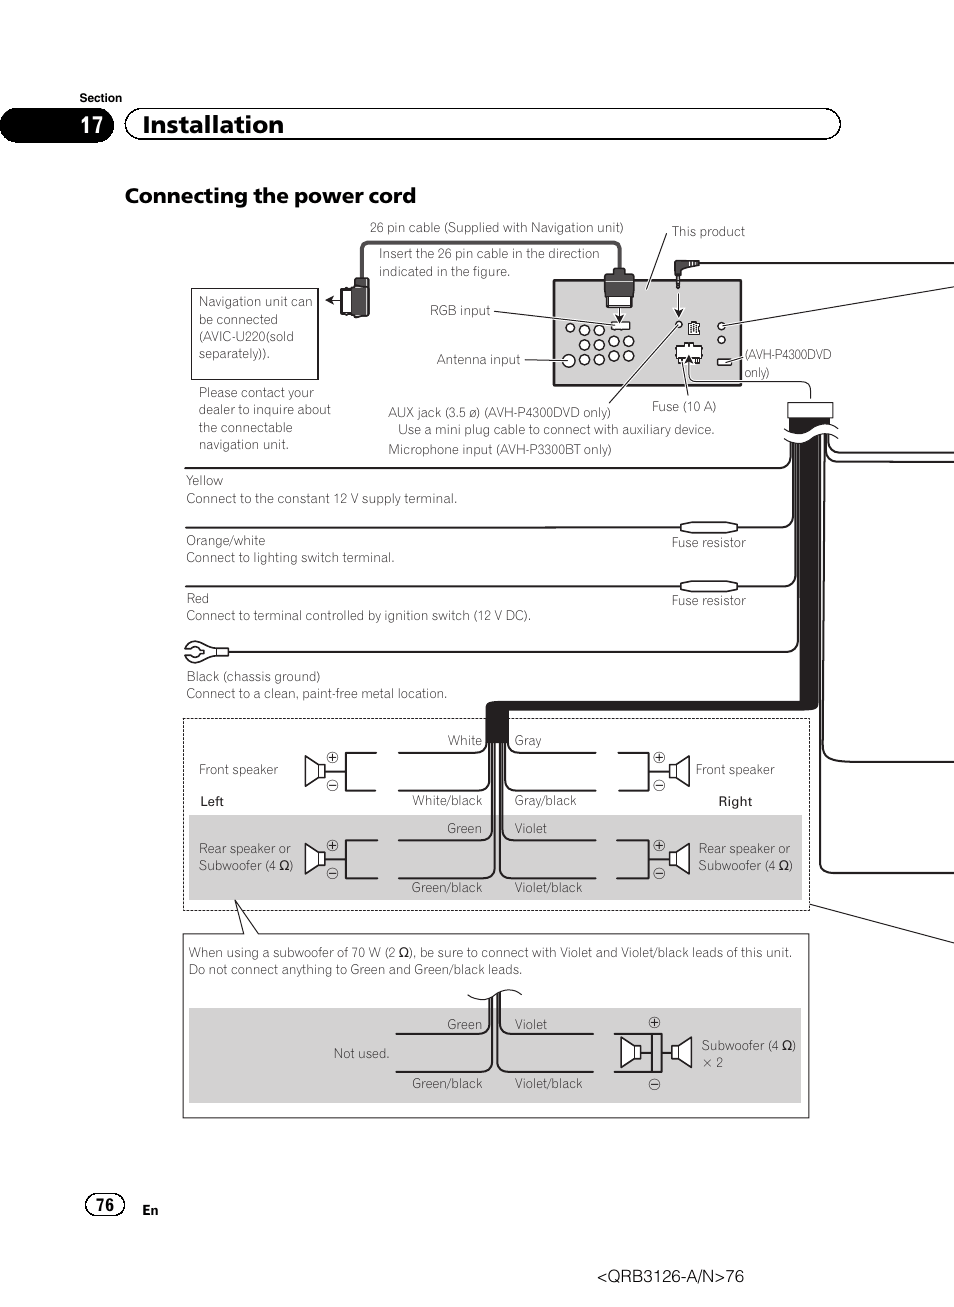 medium resolution of pioneer avh p4300dvd wiring diagram simple wiring diagrams rh 48 studio011 de pioneer avh 3300 pioneer avh p4300dvd wiring diagram